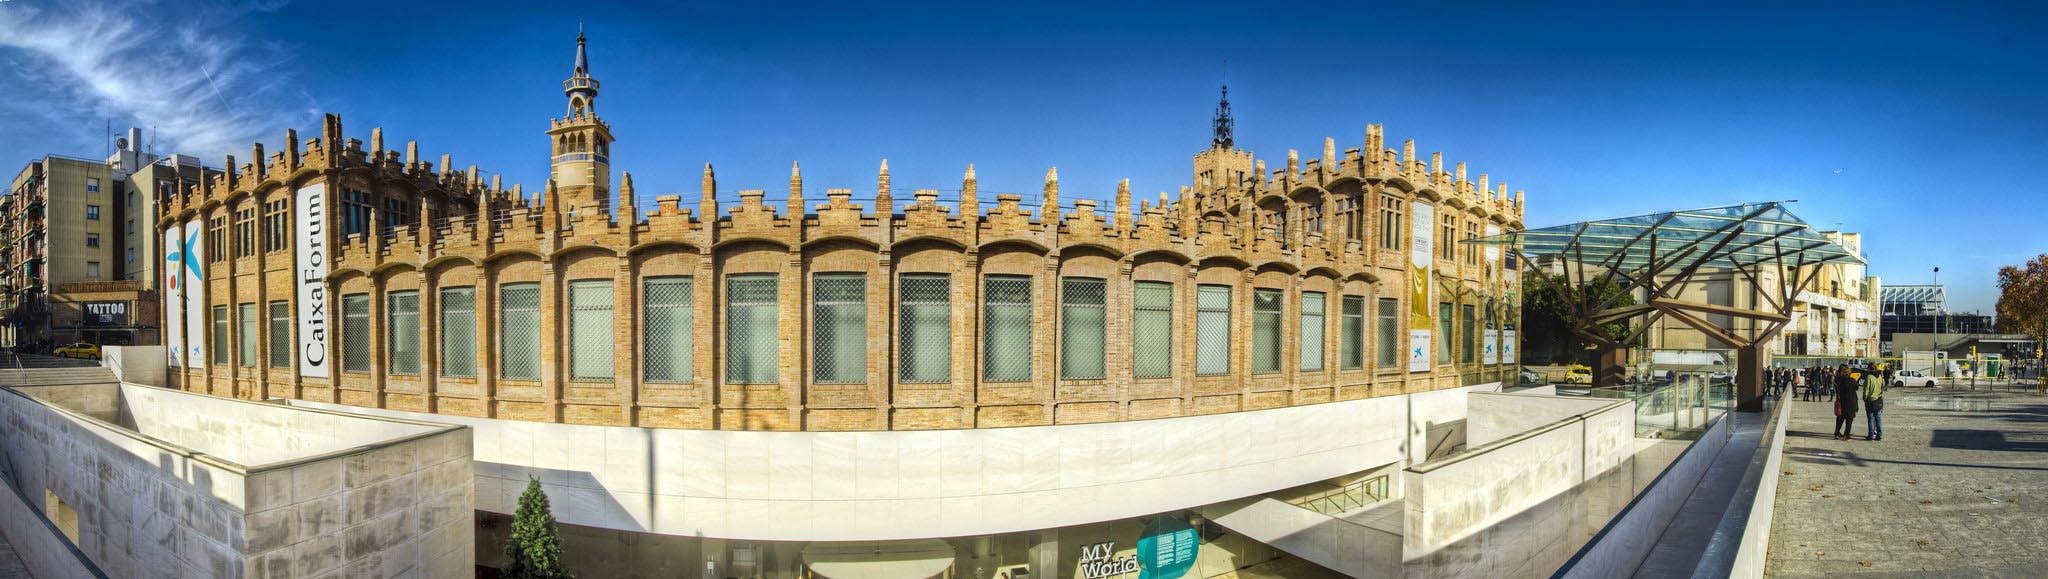 Кайша Форум в Барселоне, Испания